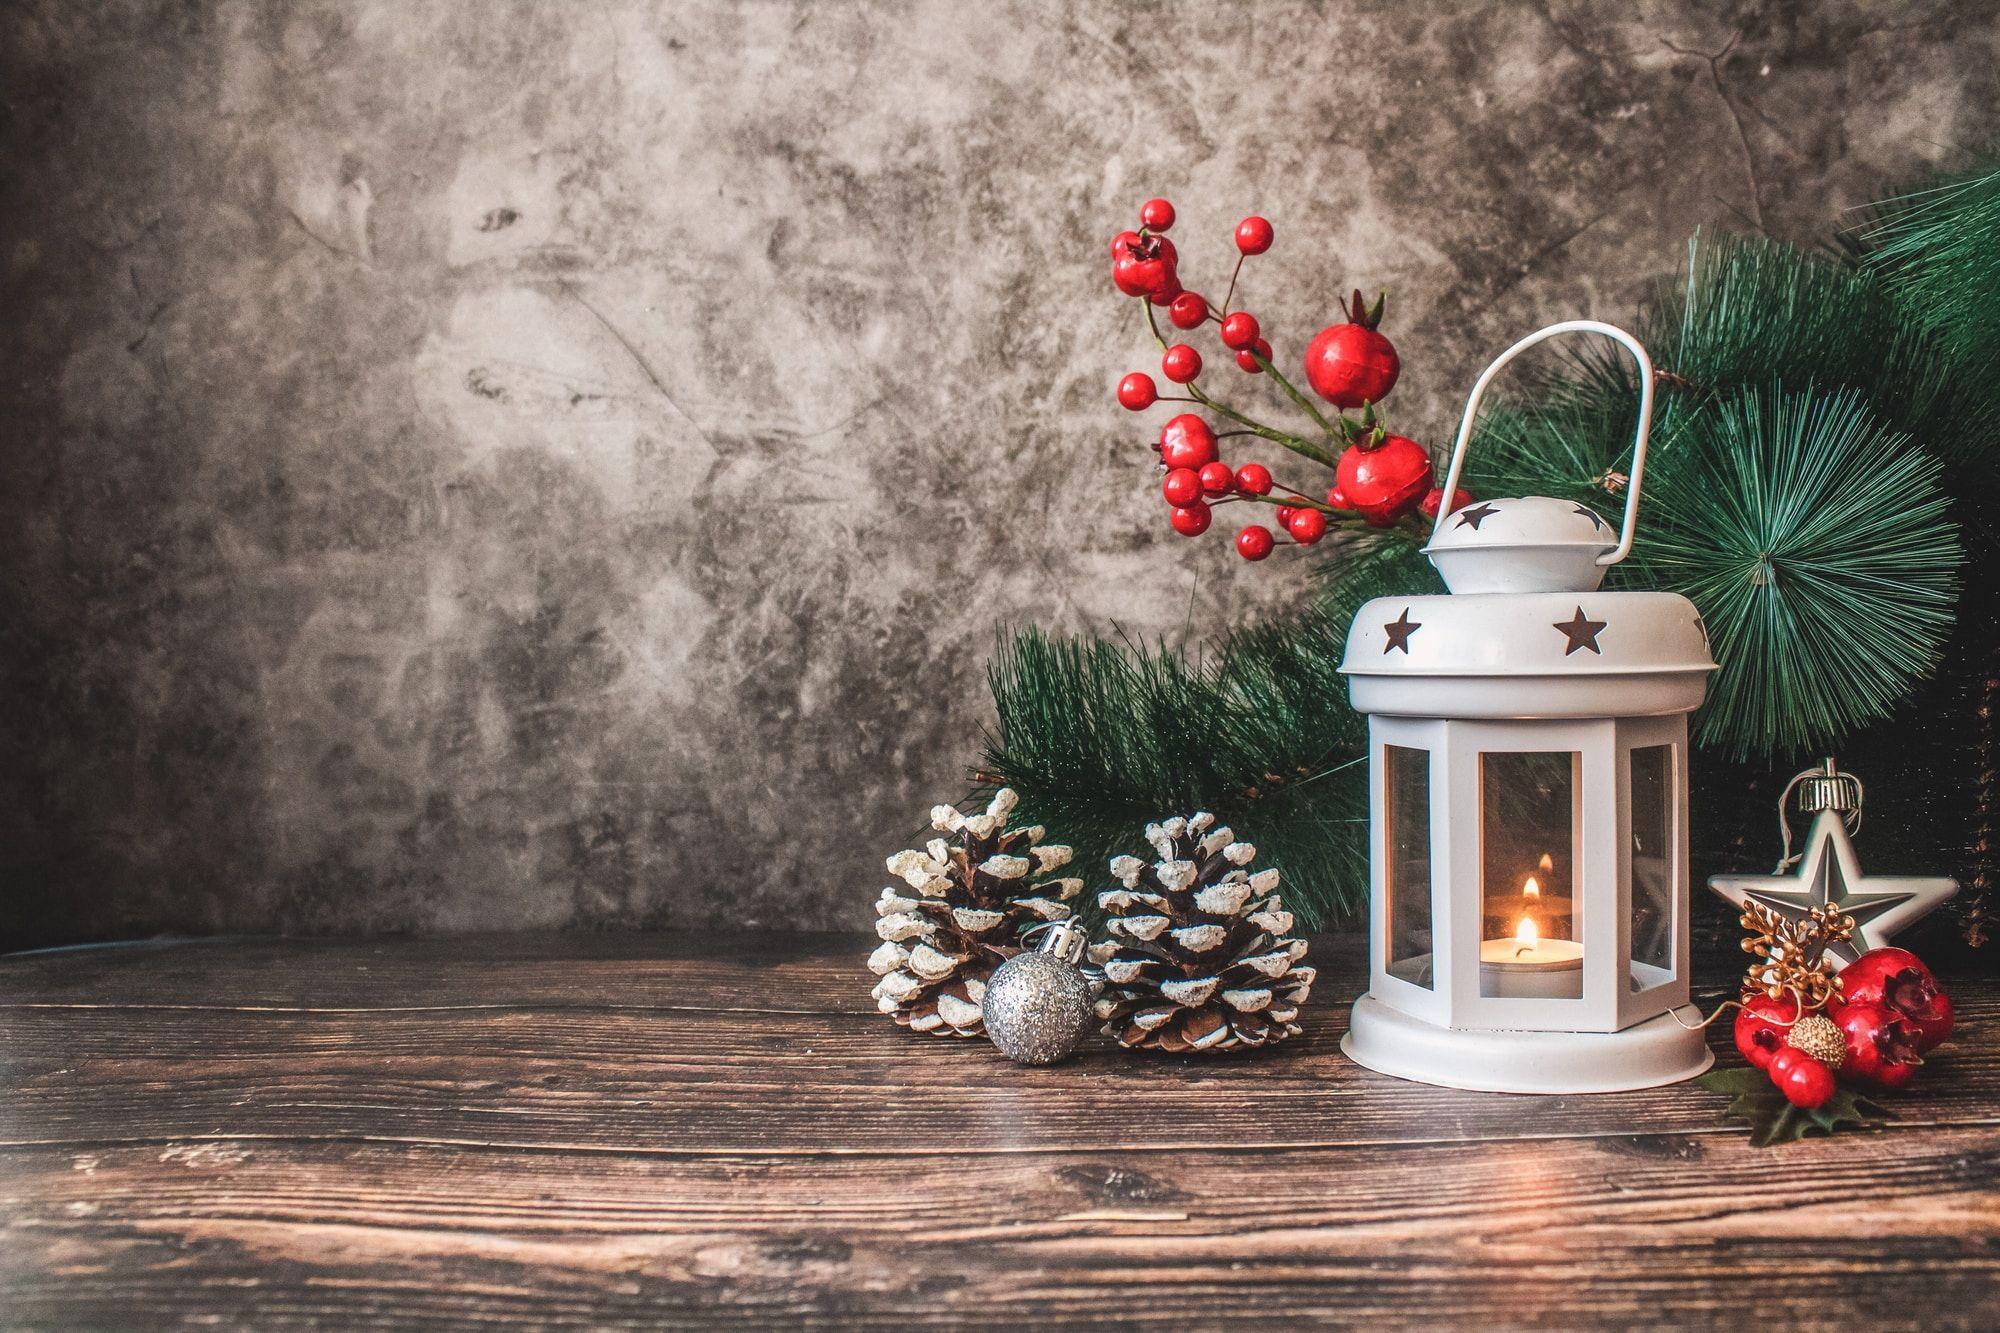 Christmas at Whispering Nature Vintage